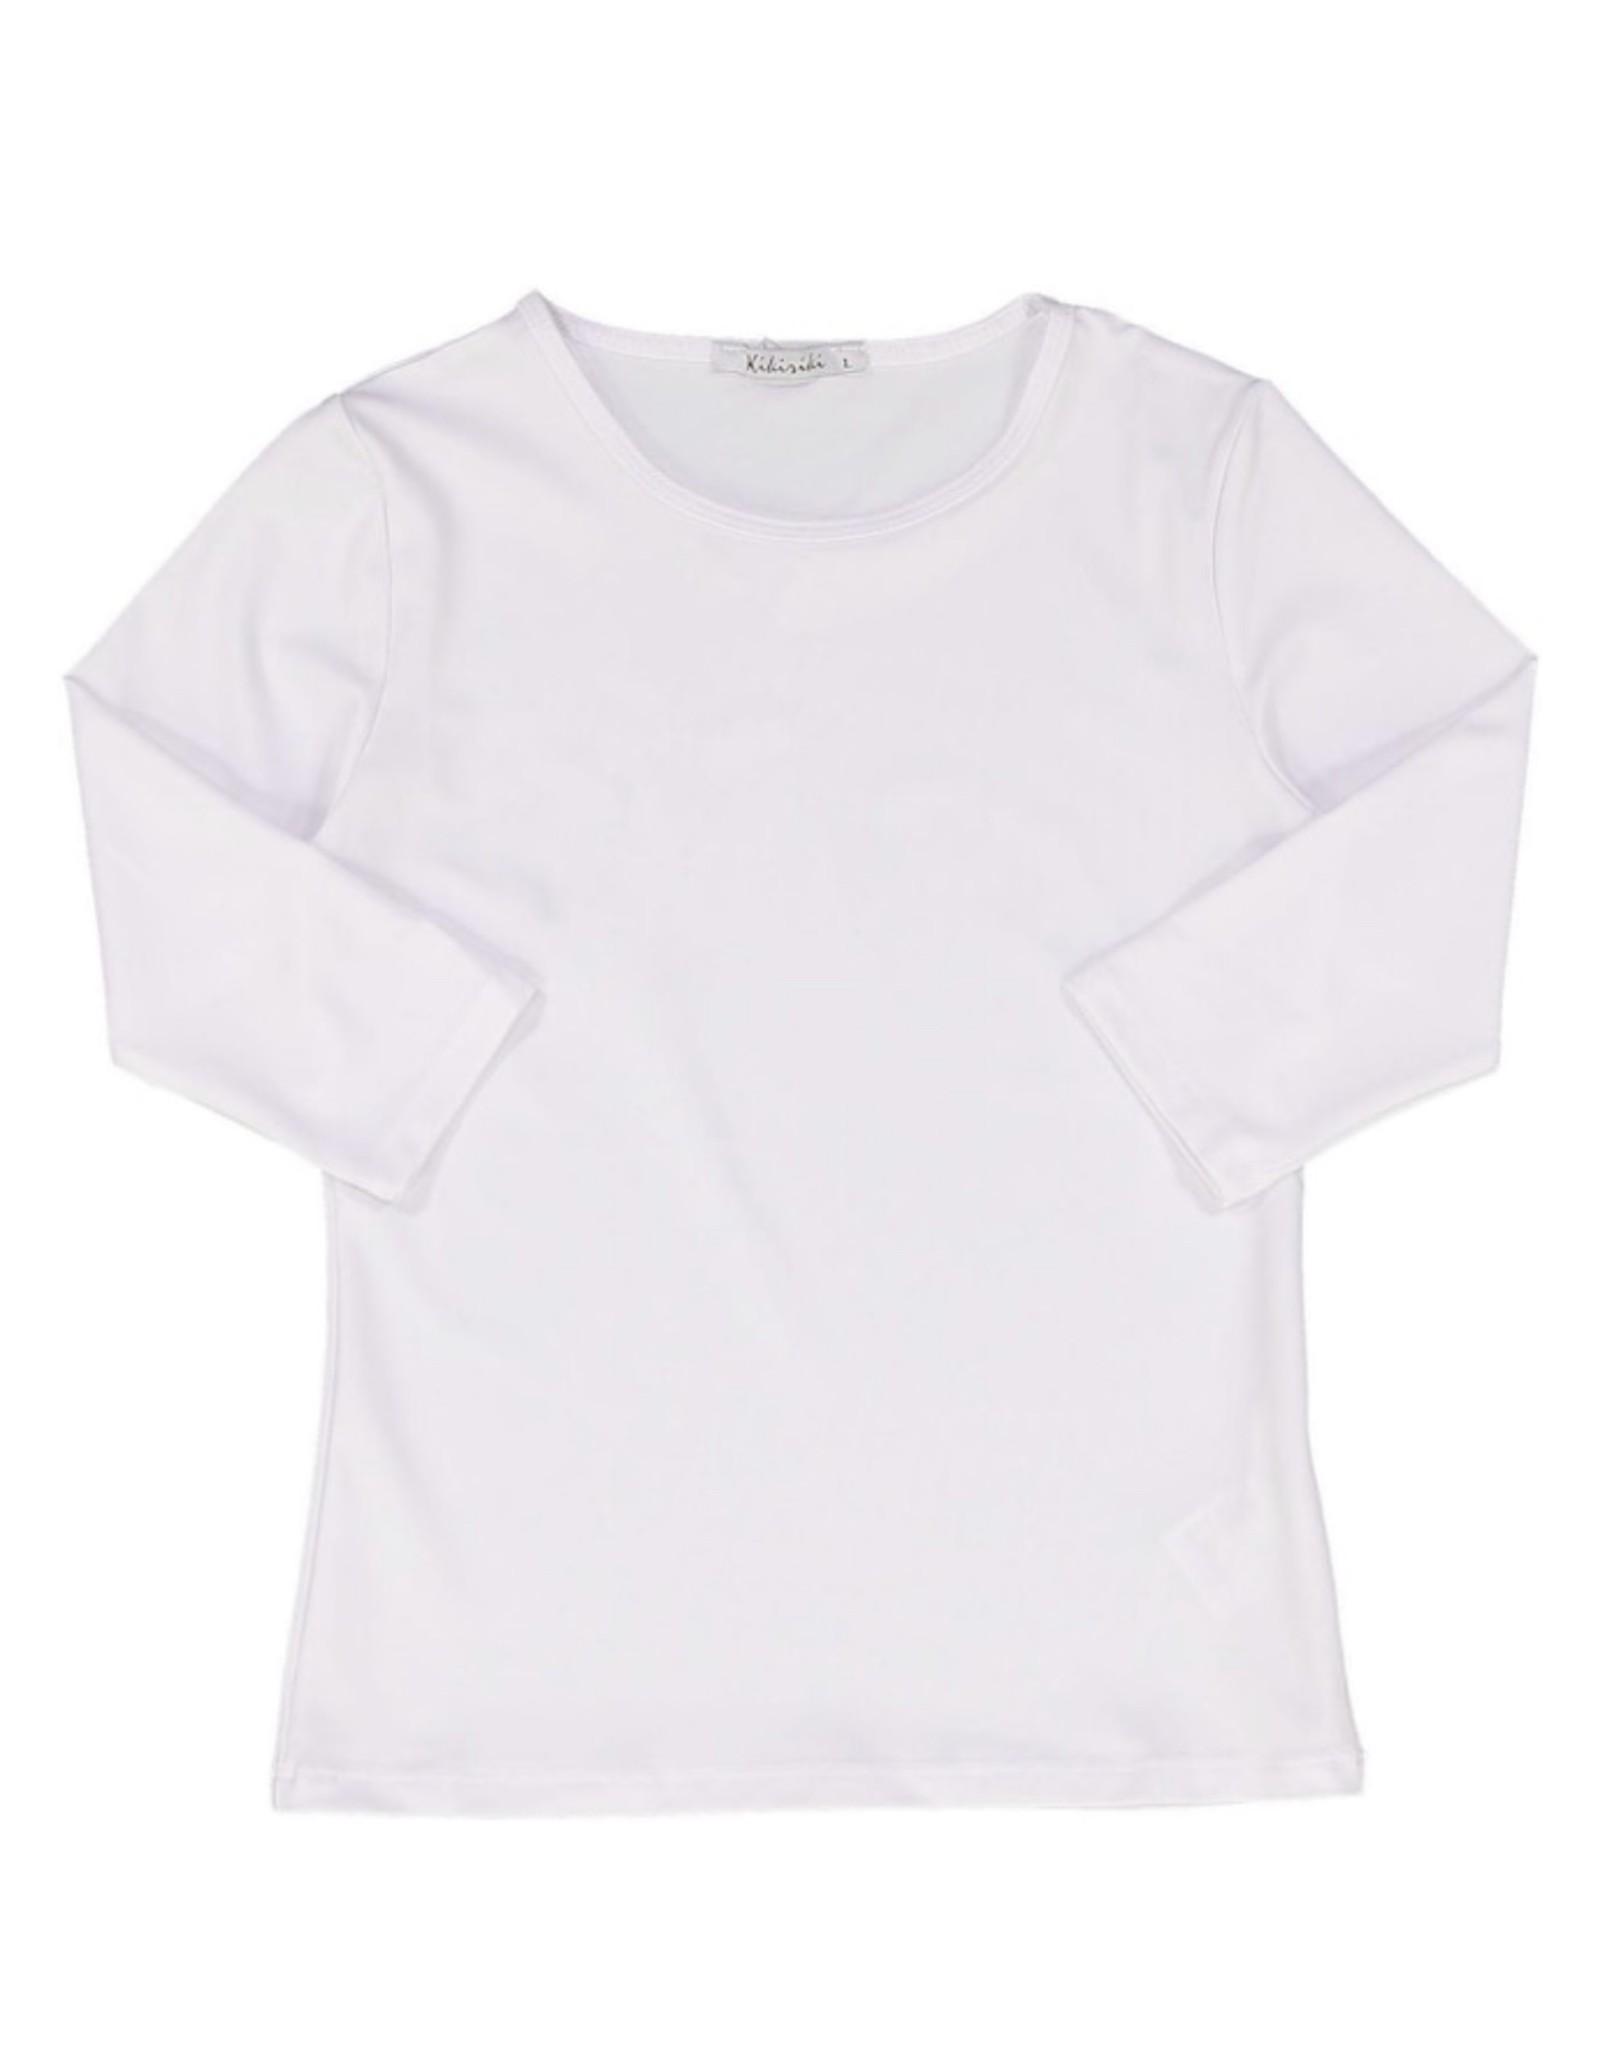 Kiki Riki Kiki Riki Girls Long Sleeve Lycra Shell 18923